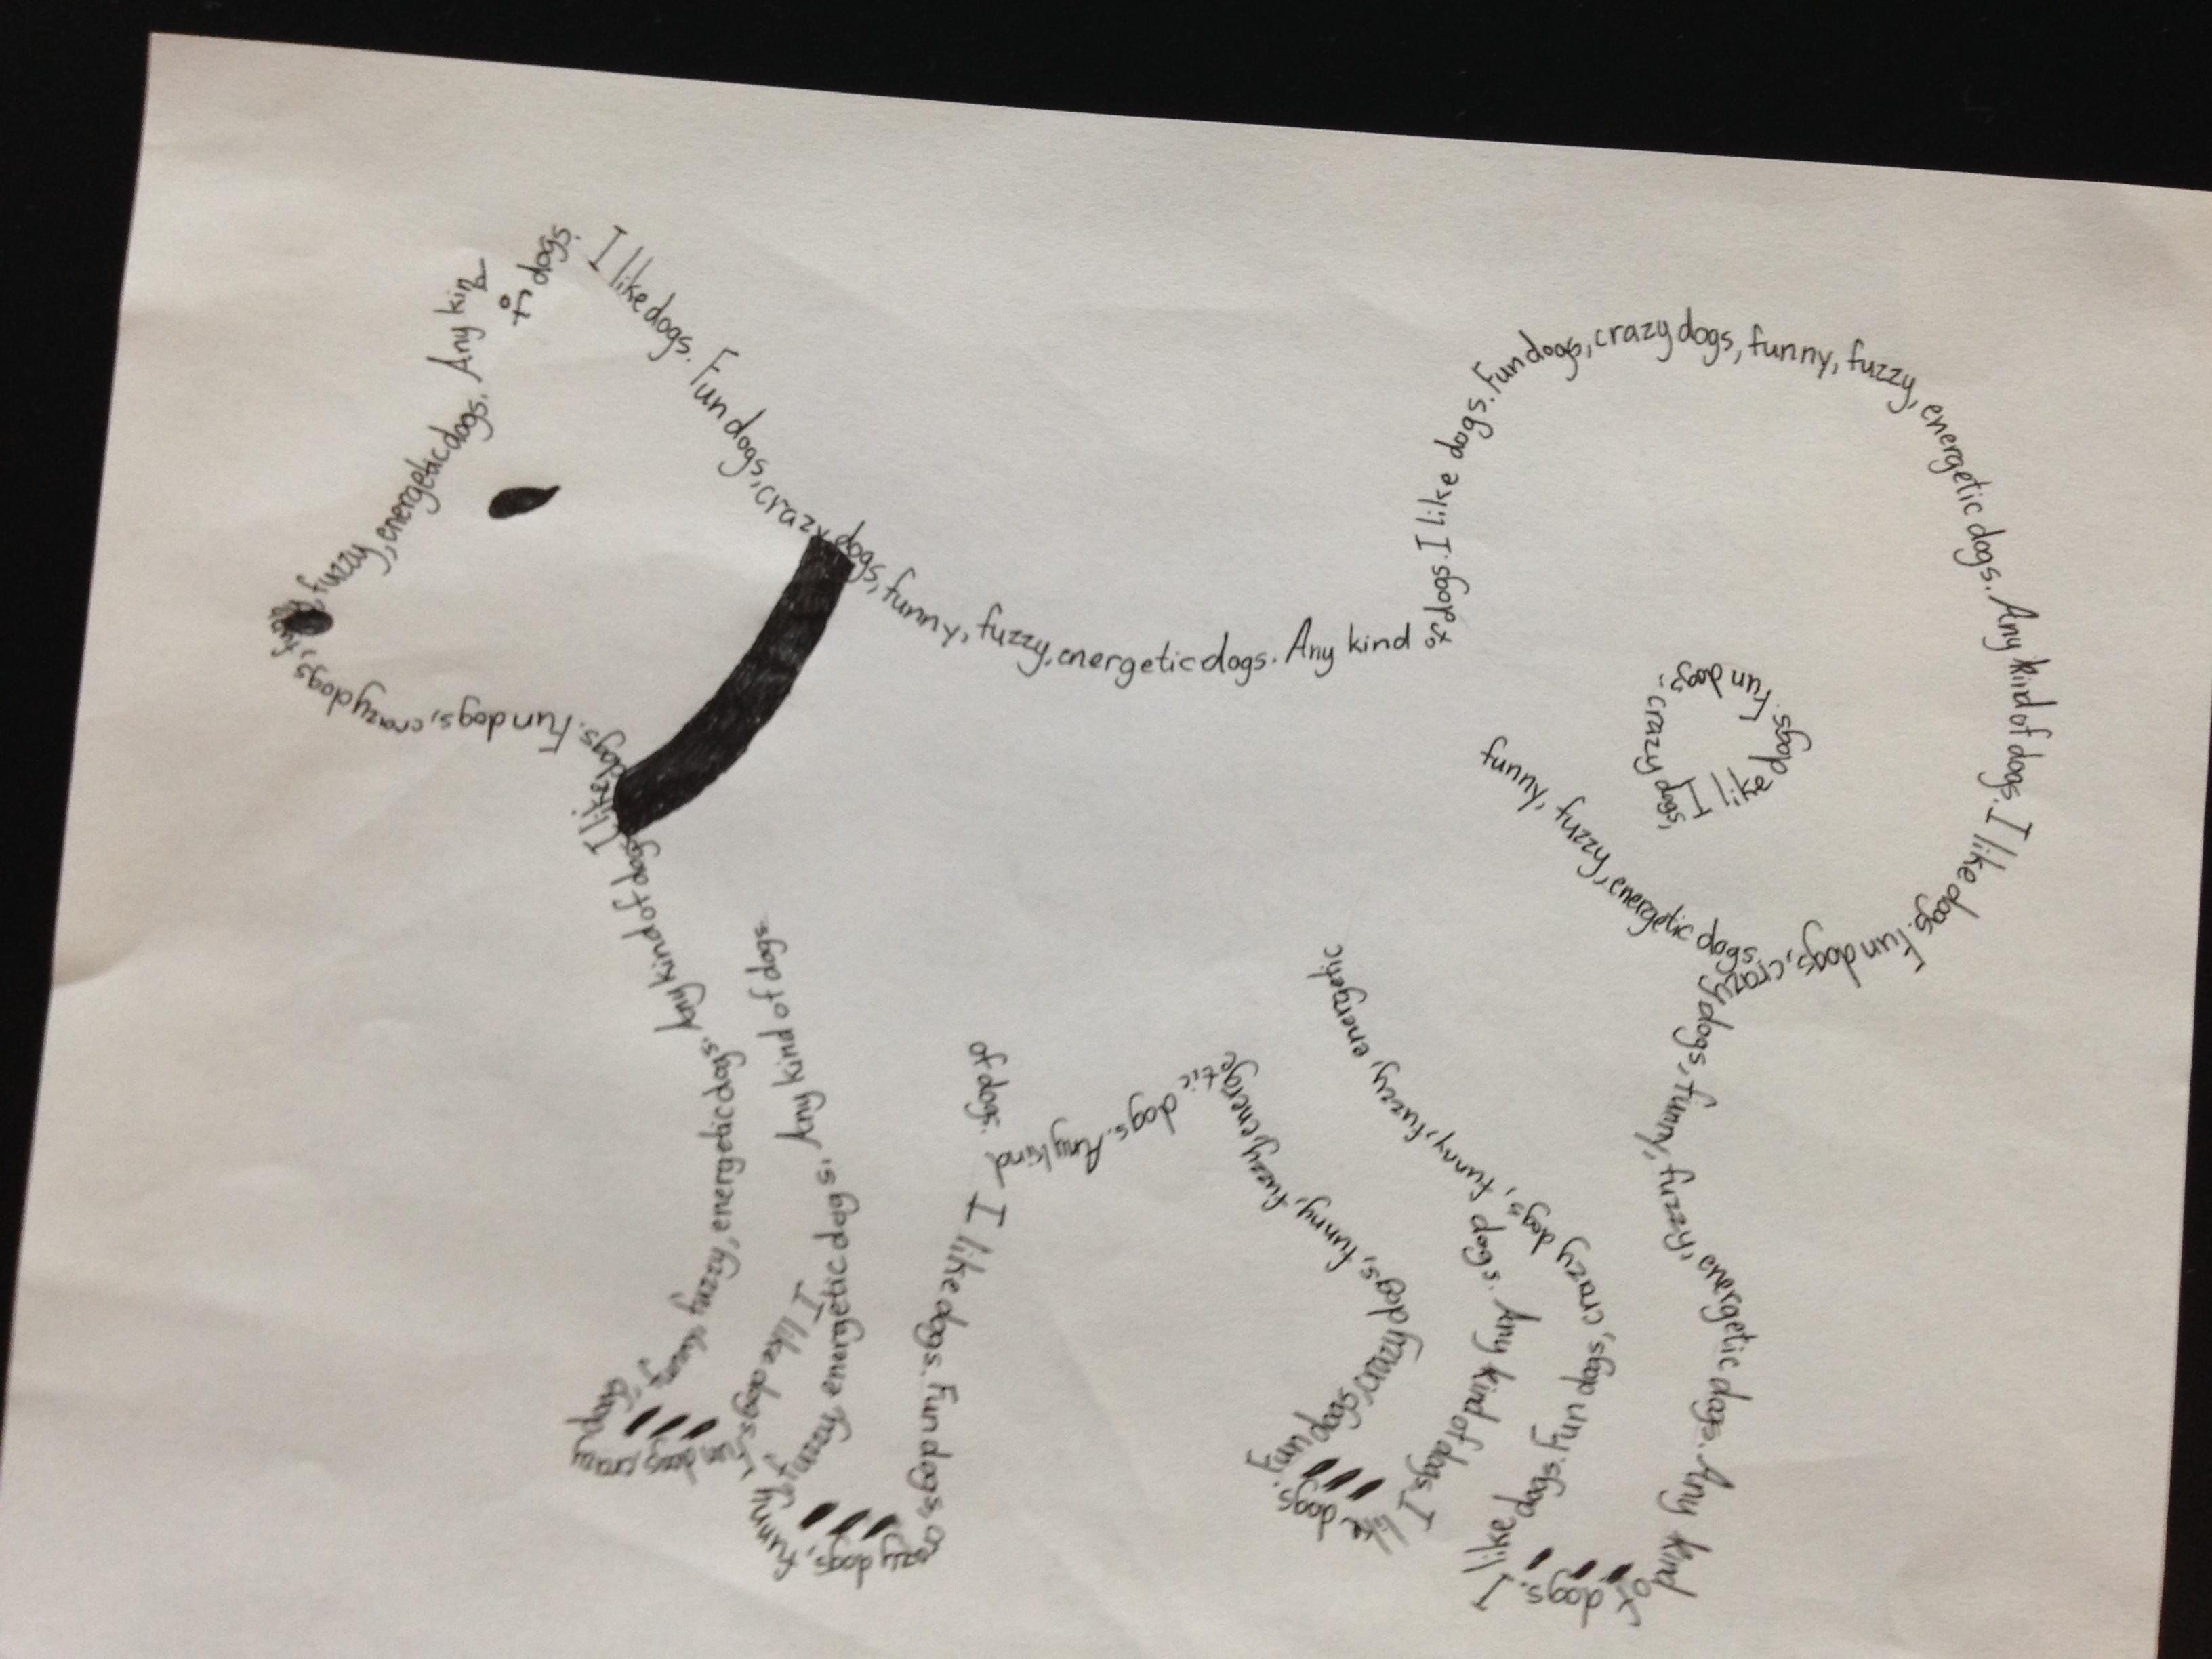 Concrete Poem Examples Middle School